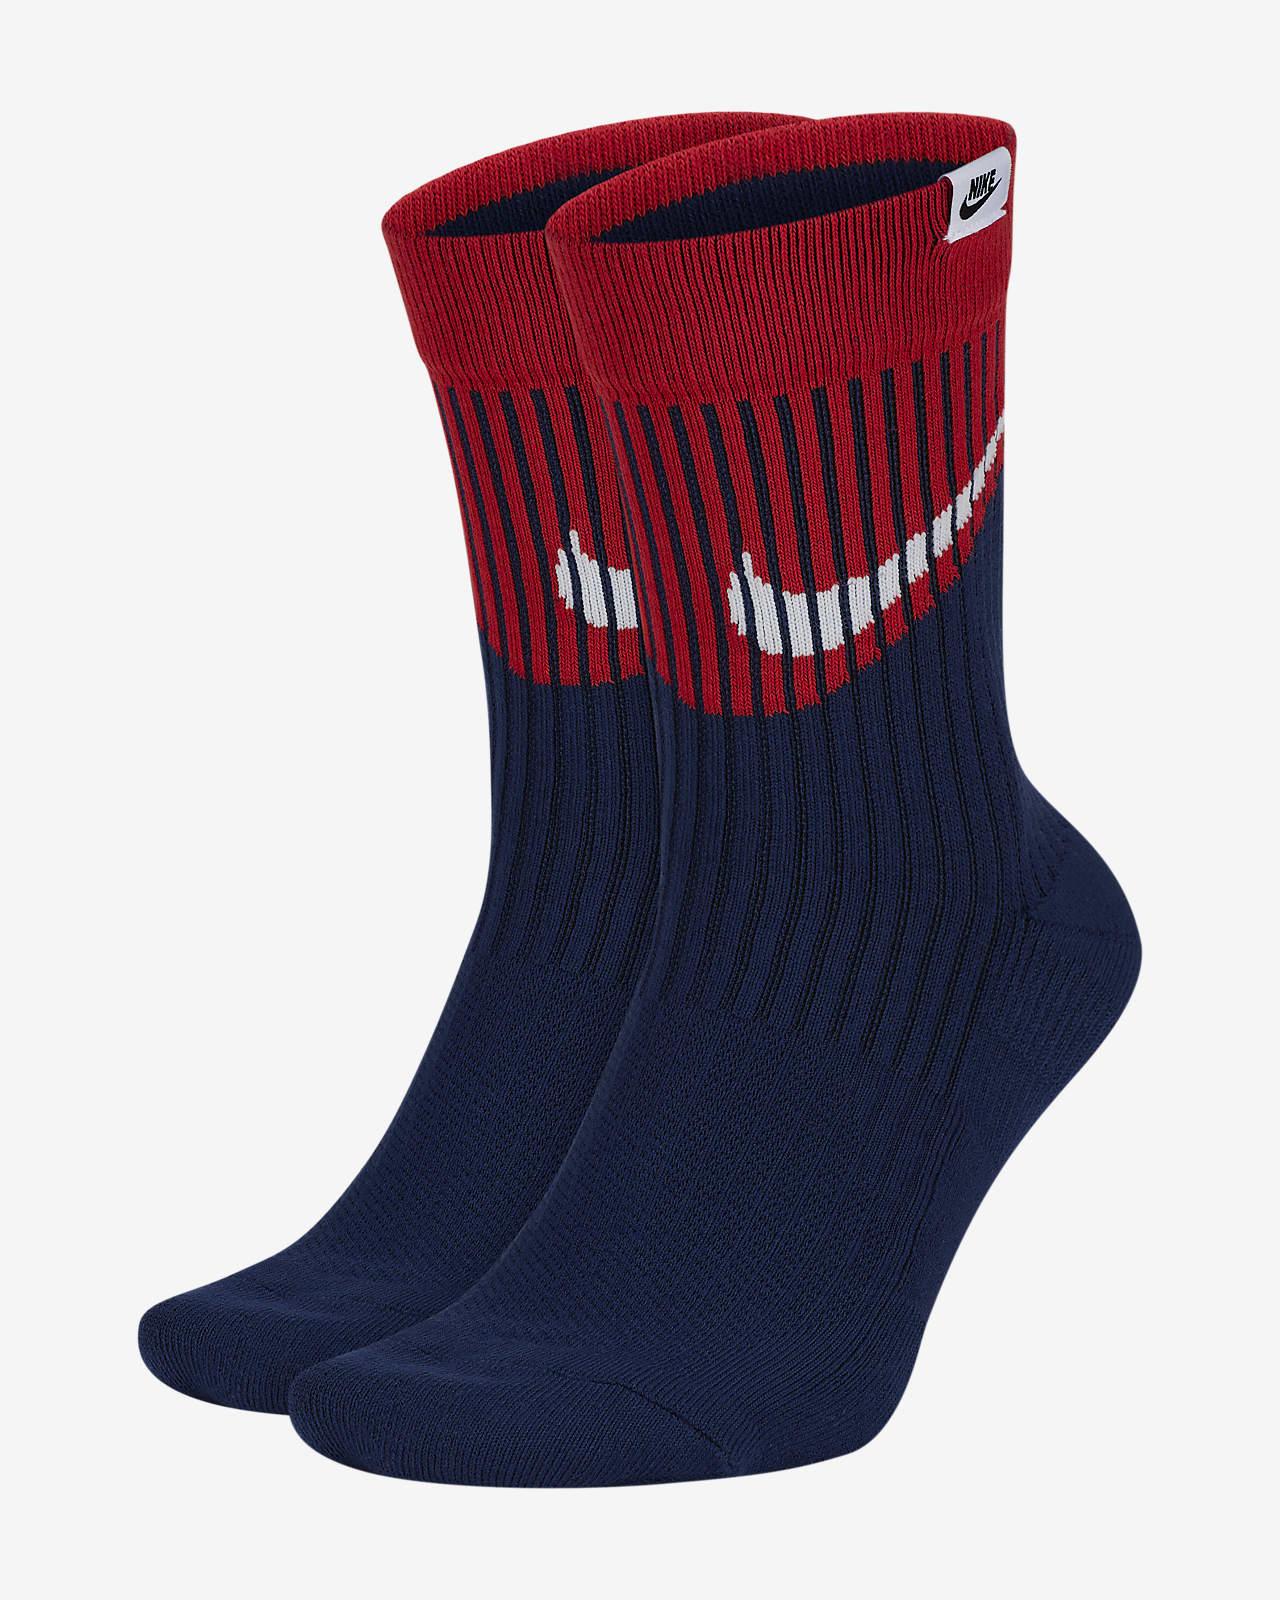 Nike SNEAKR Sox Swoosh Crew Socks (2 Pairs)